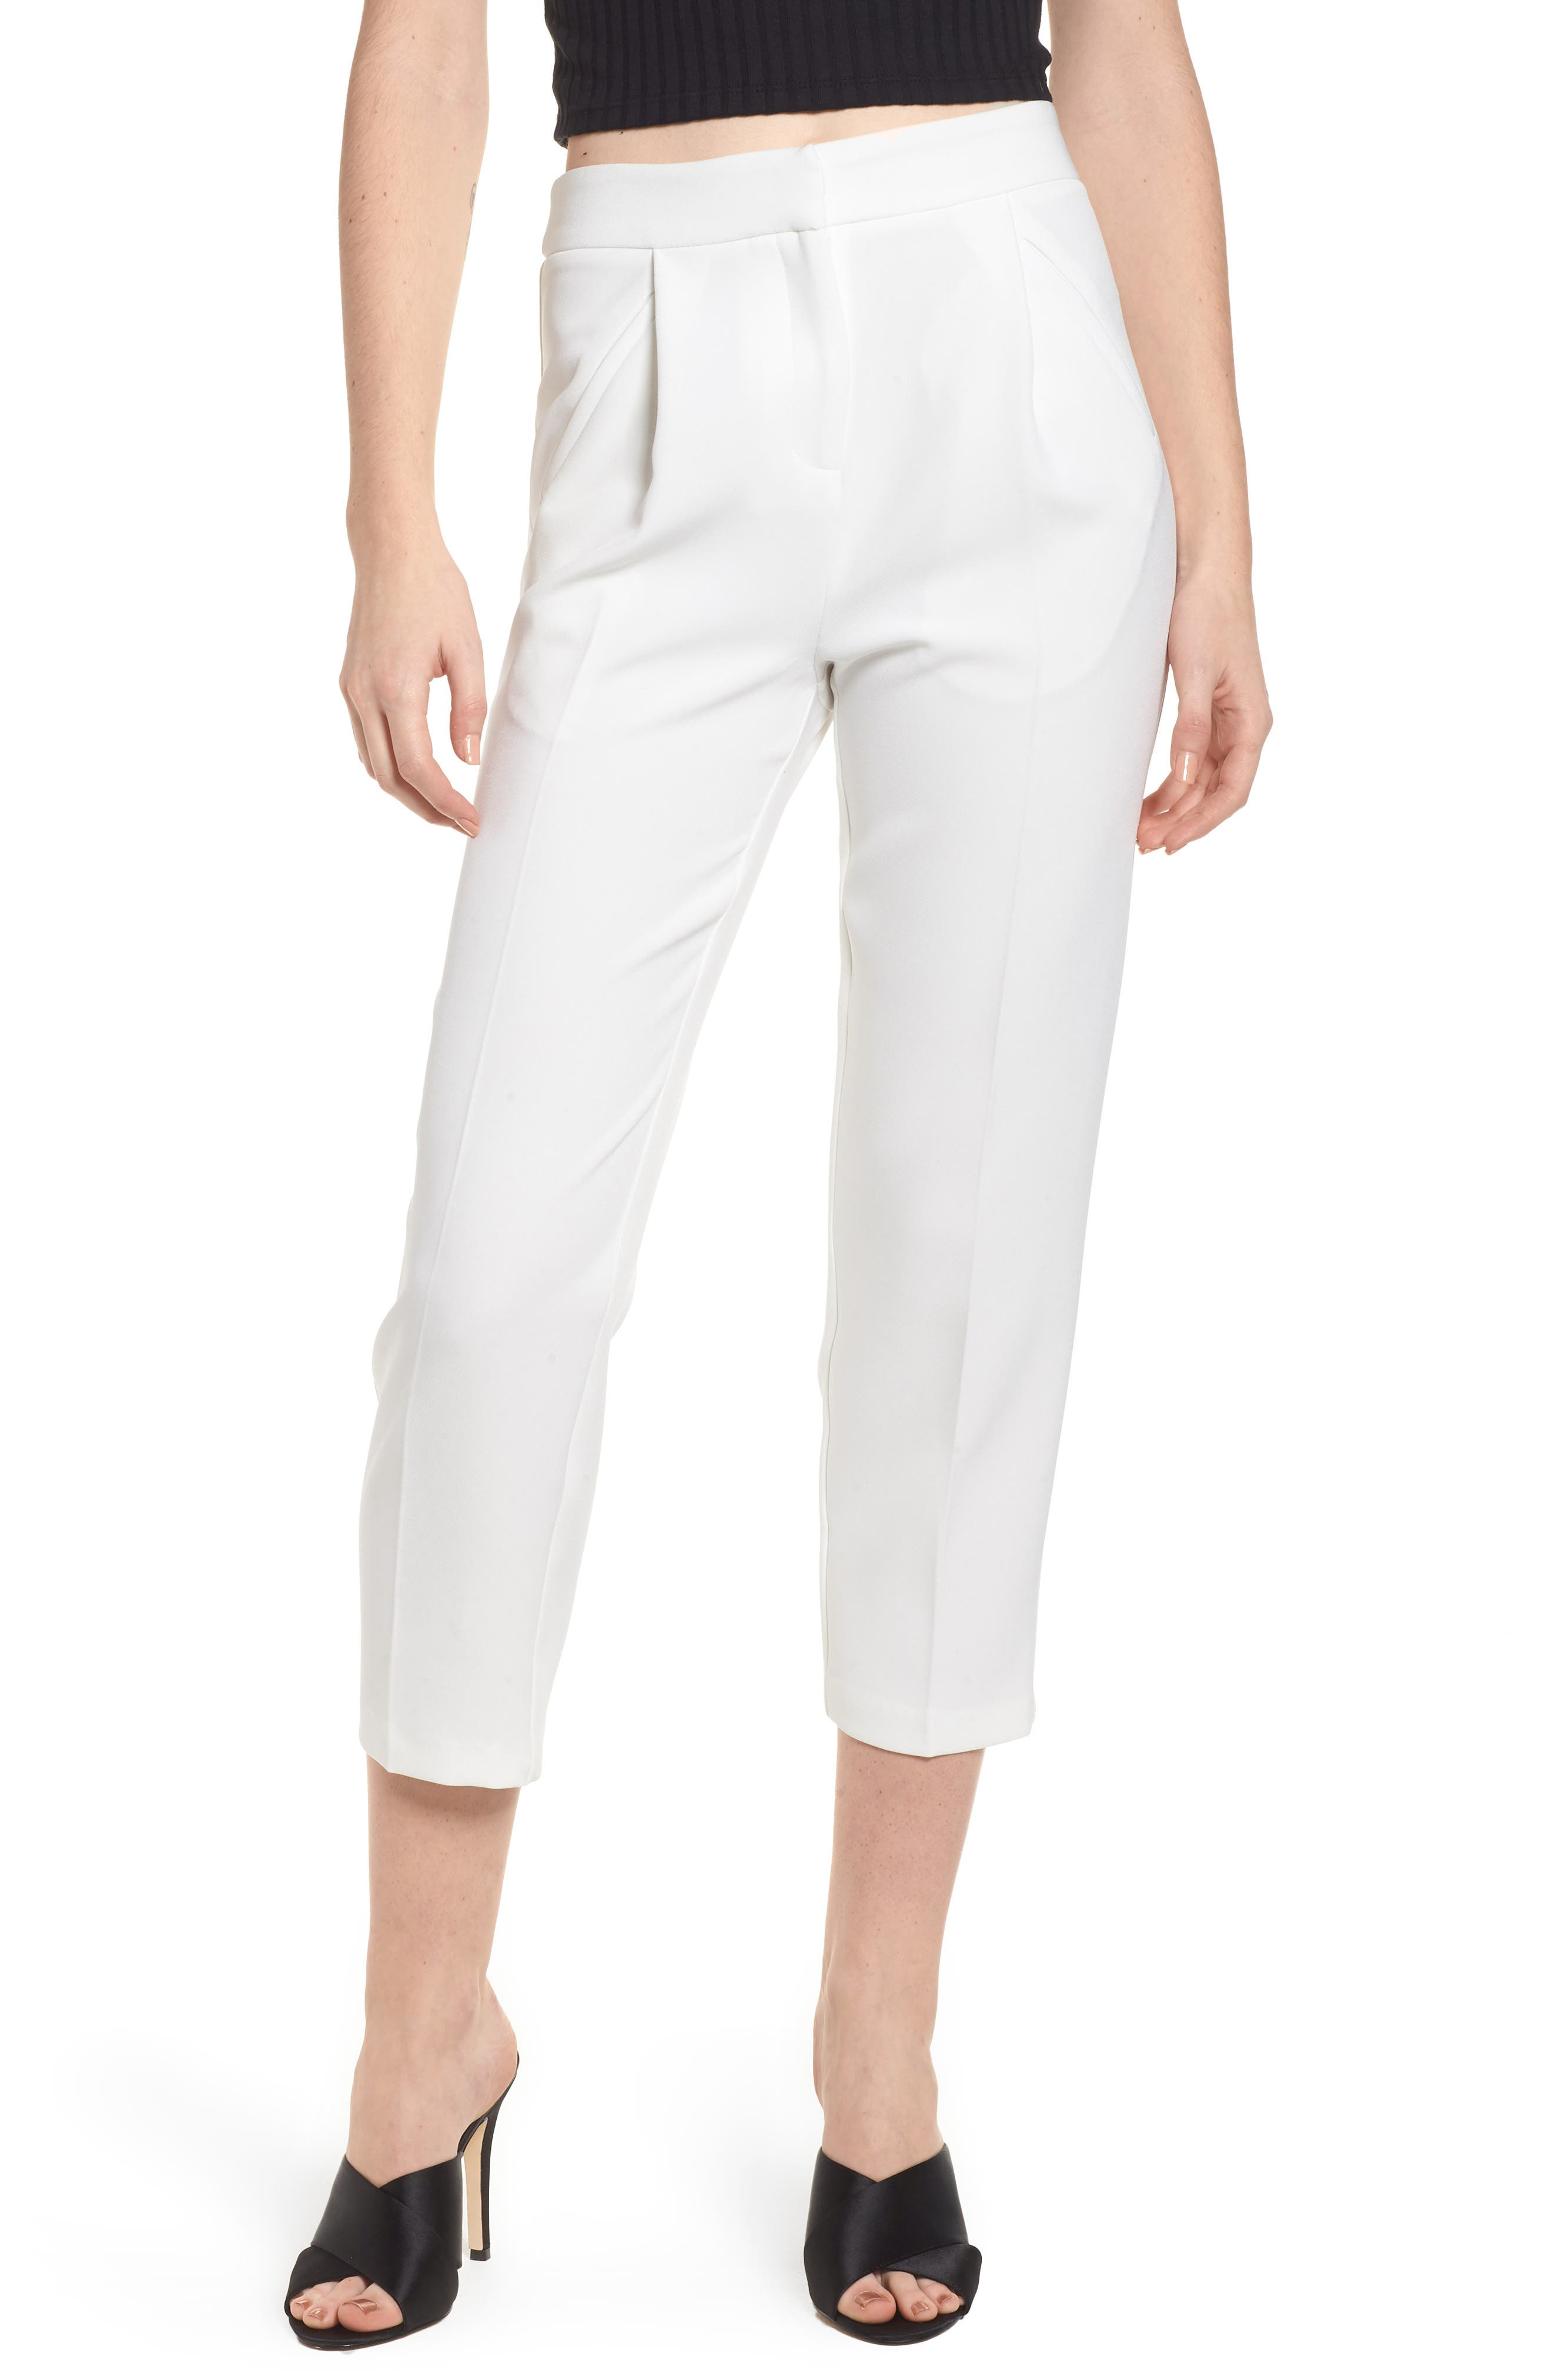 Main Image - Topshop Clean Pocket Peg Trousers